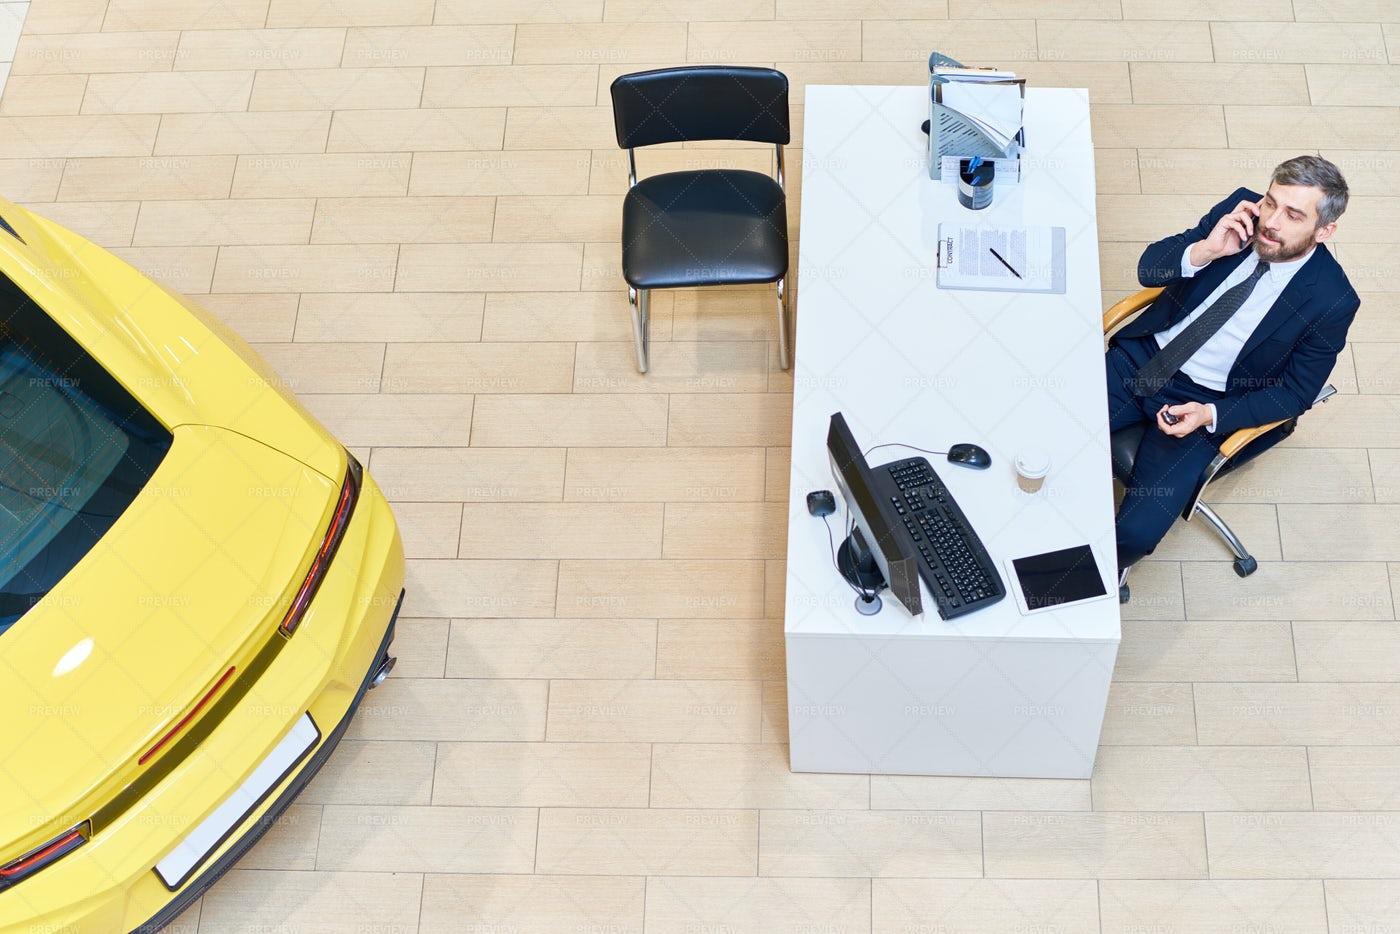 Car Salesman Speaking By Phone: Stock Photos